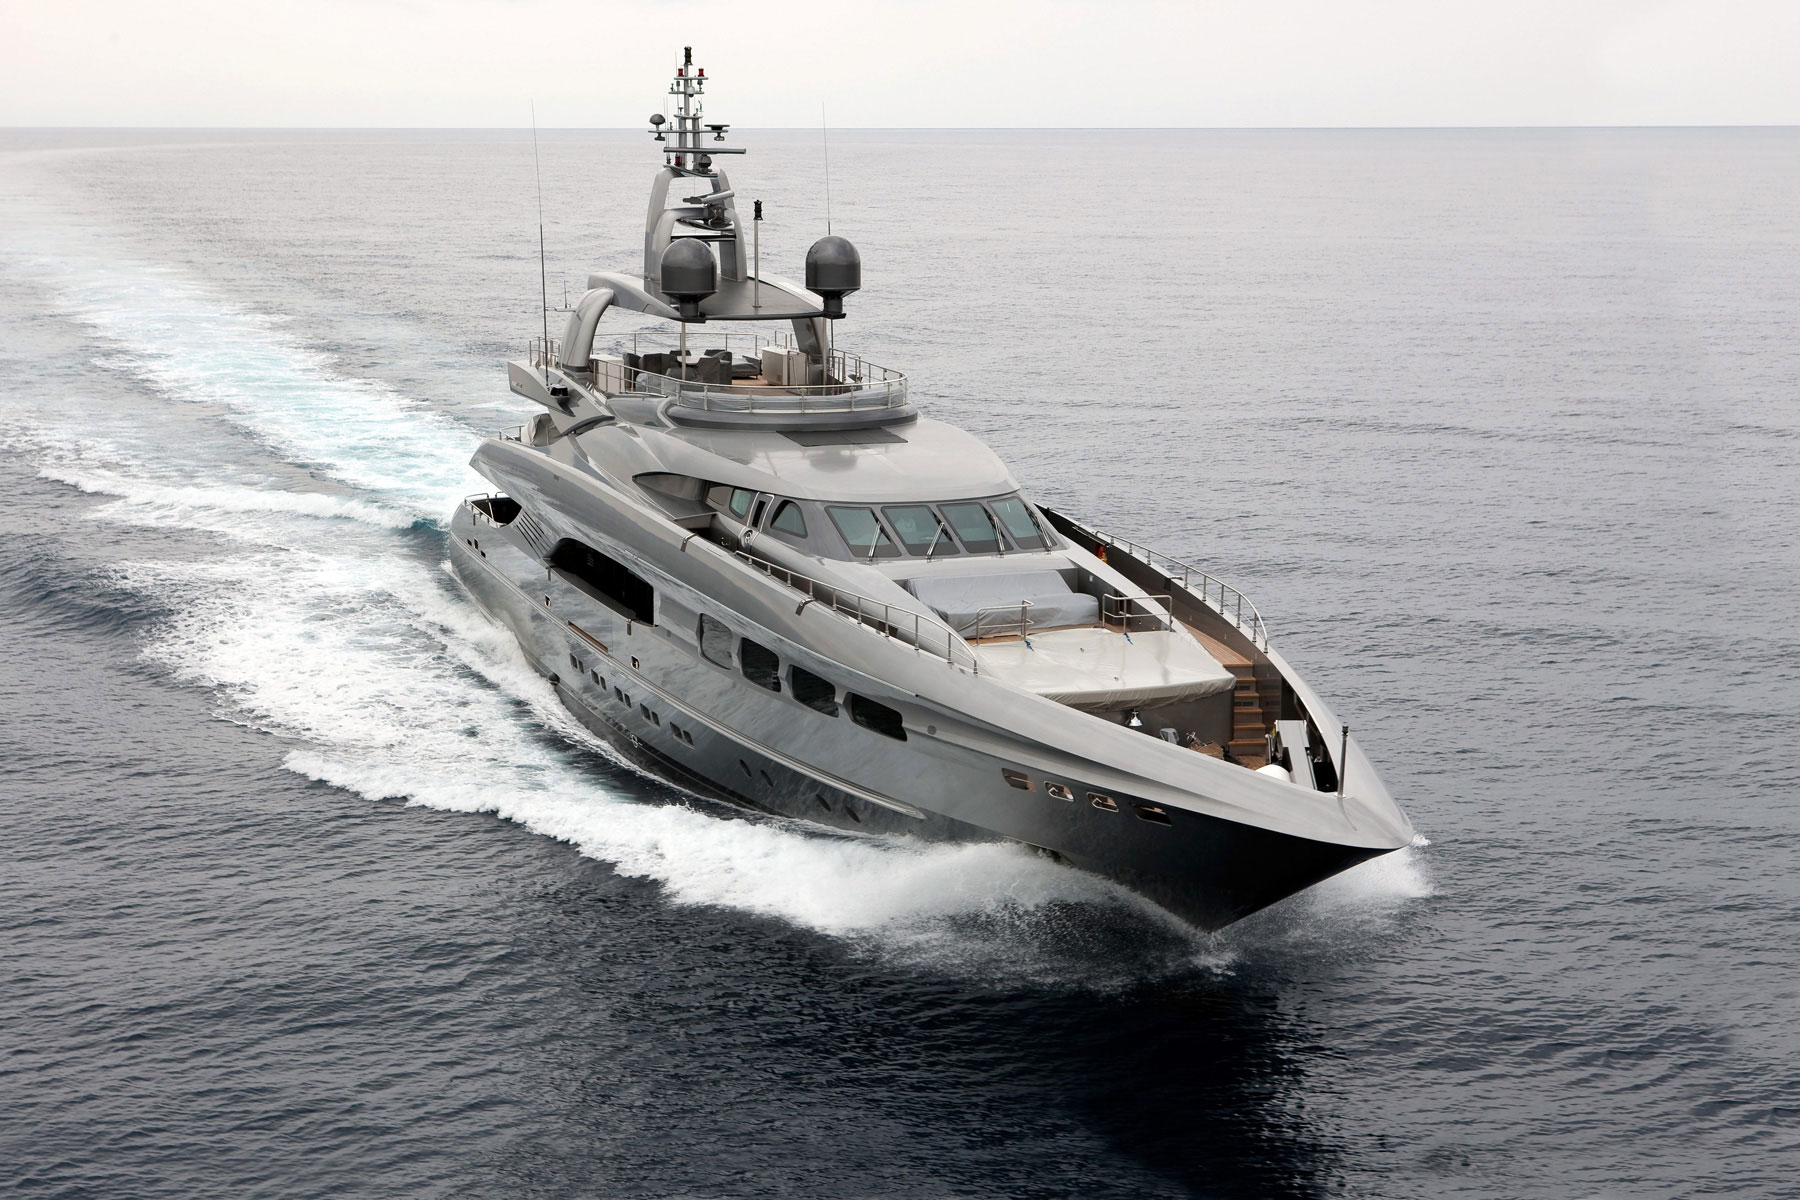 Luxury motor yacht Streamline by Mondo Marine